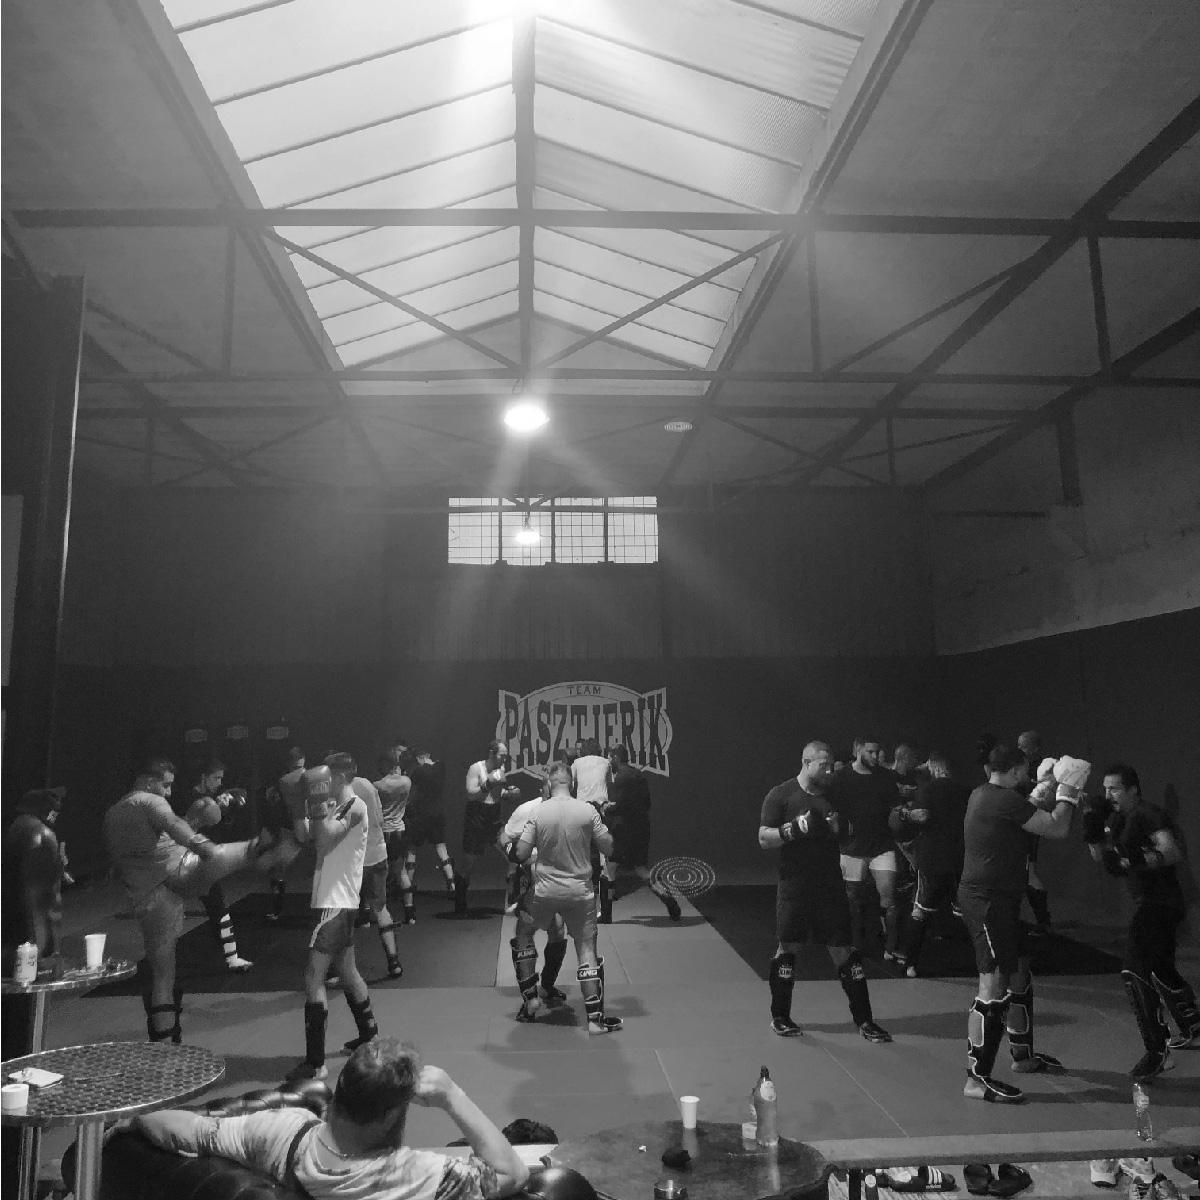 Kickboksles bij Team Pasztjerik Gym Schiedam